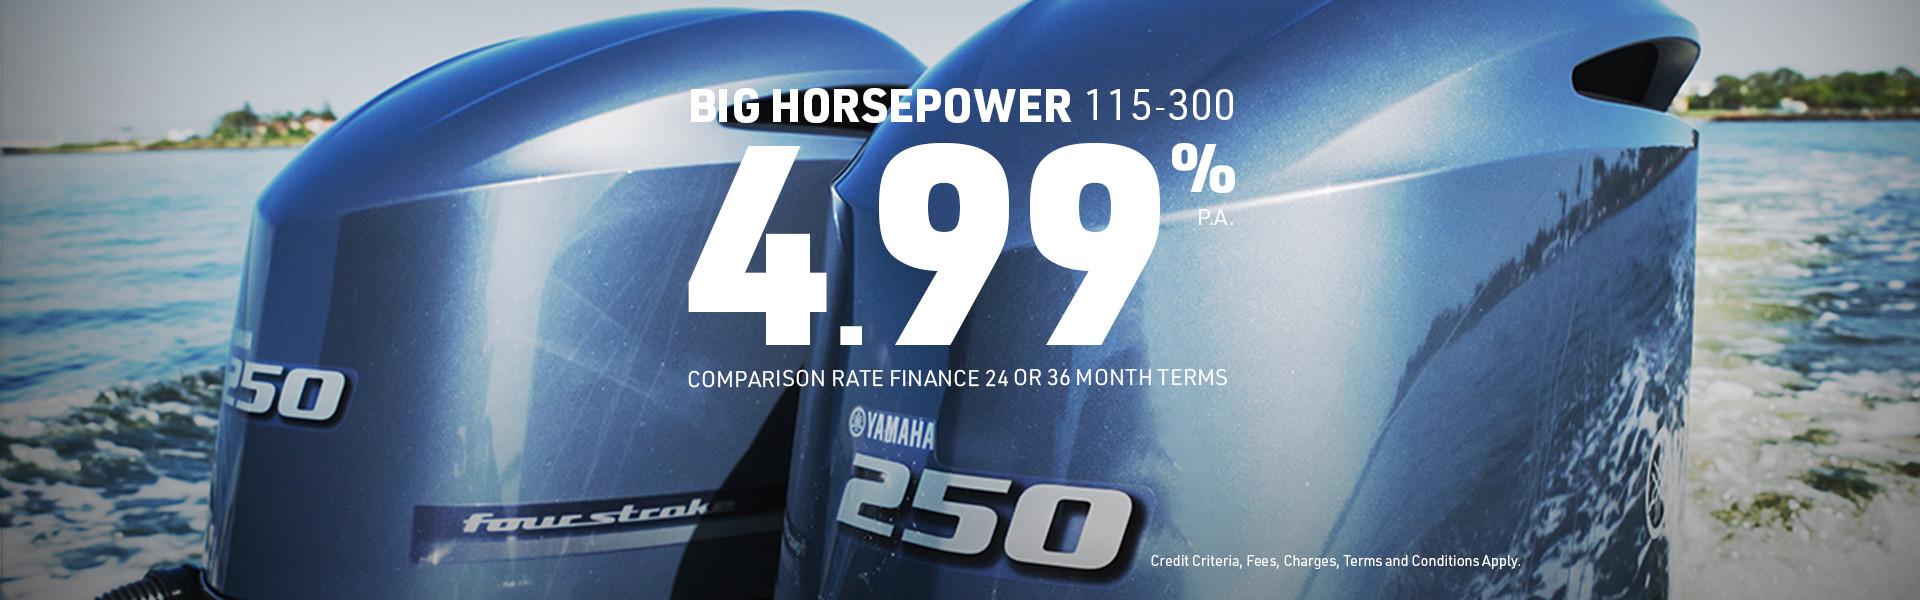 Yamaha 4.99% Interest on Bighorsepower